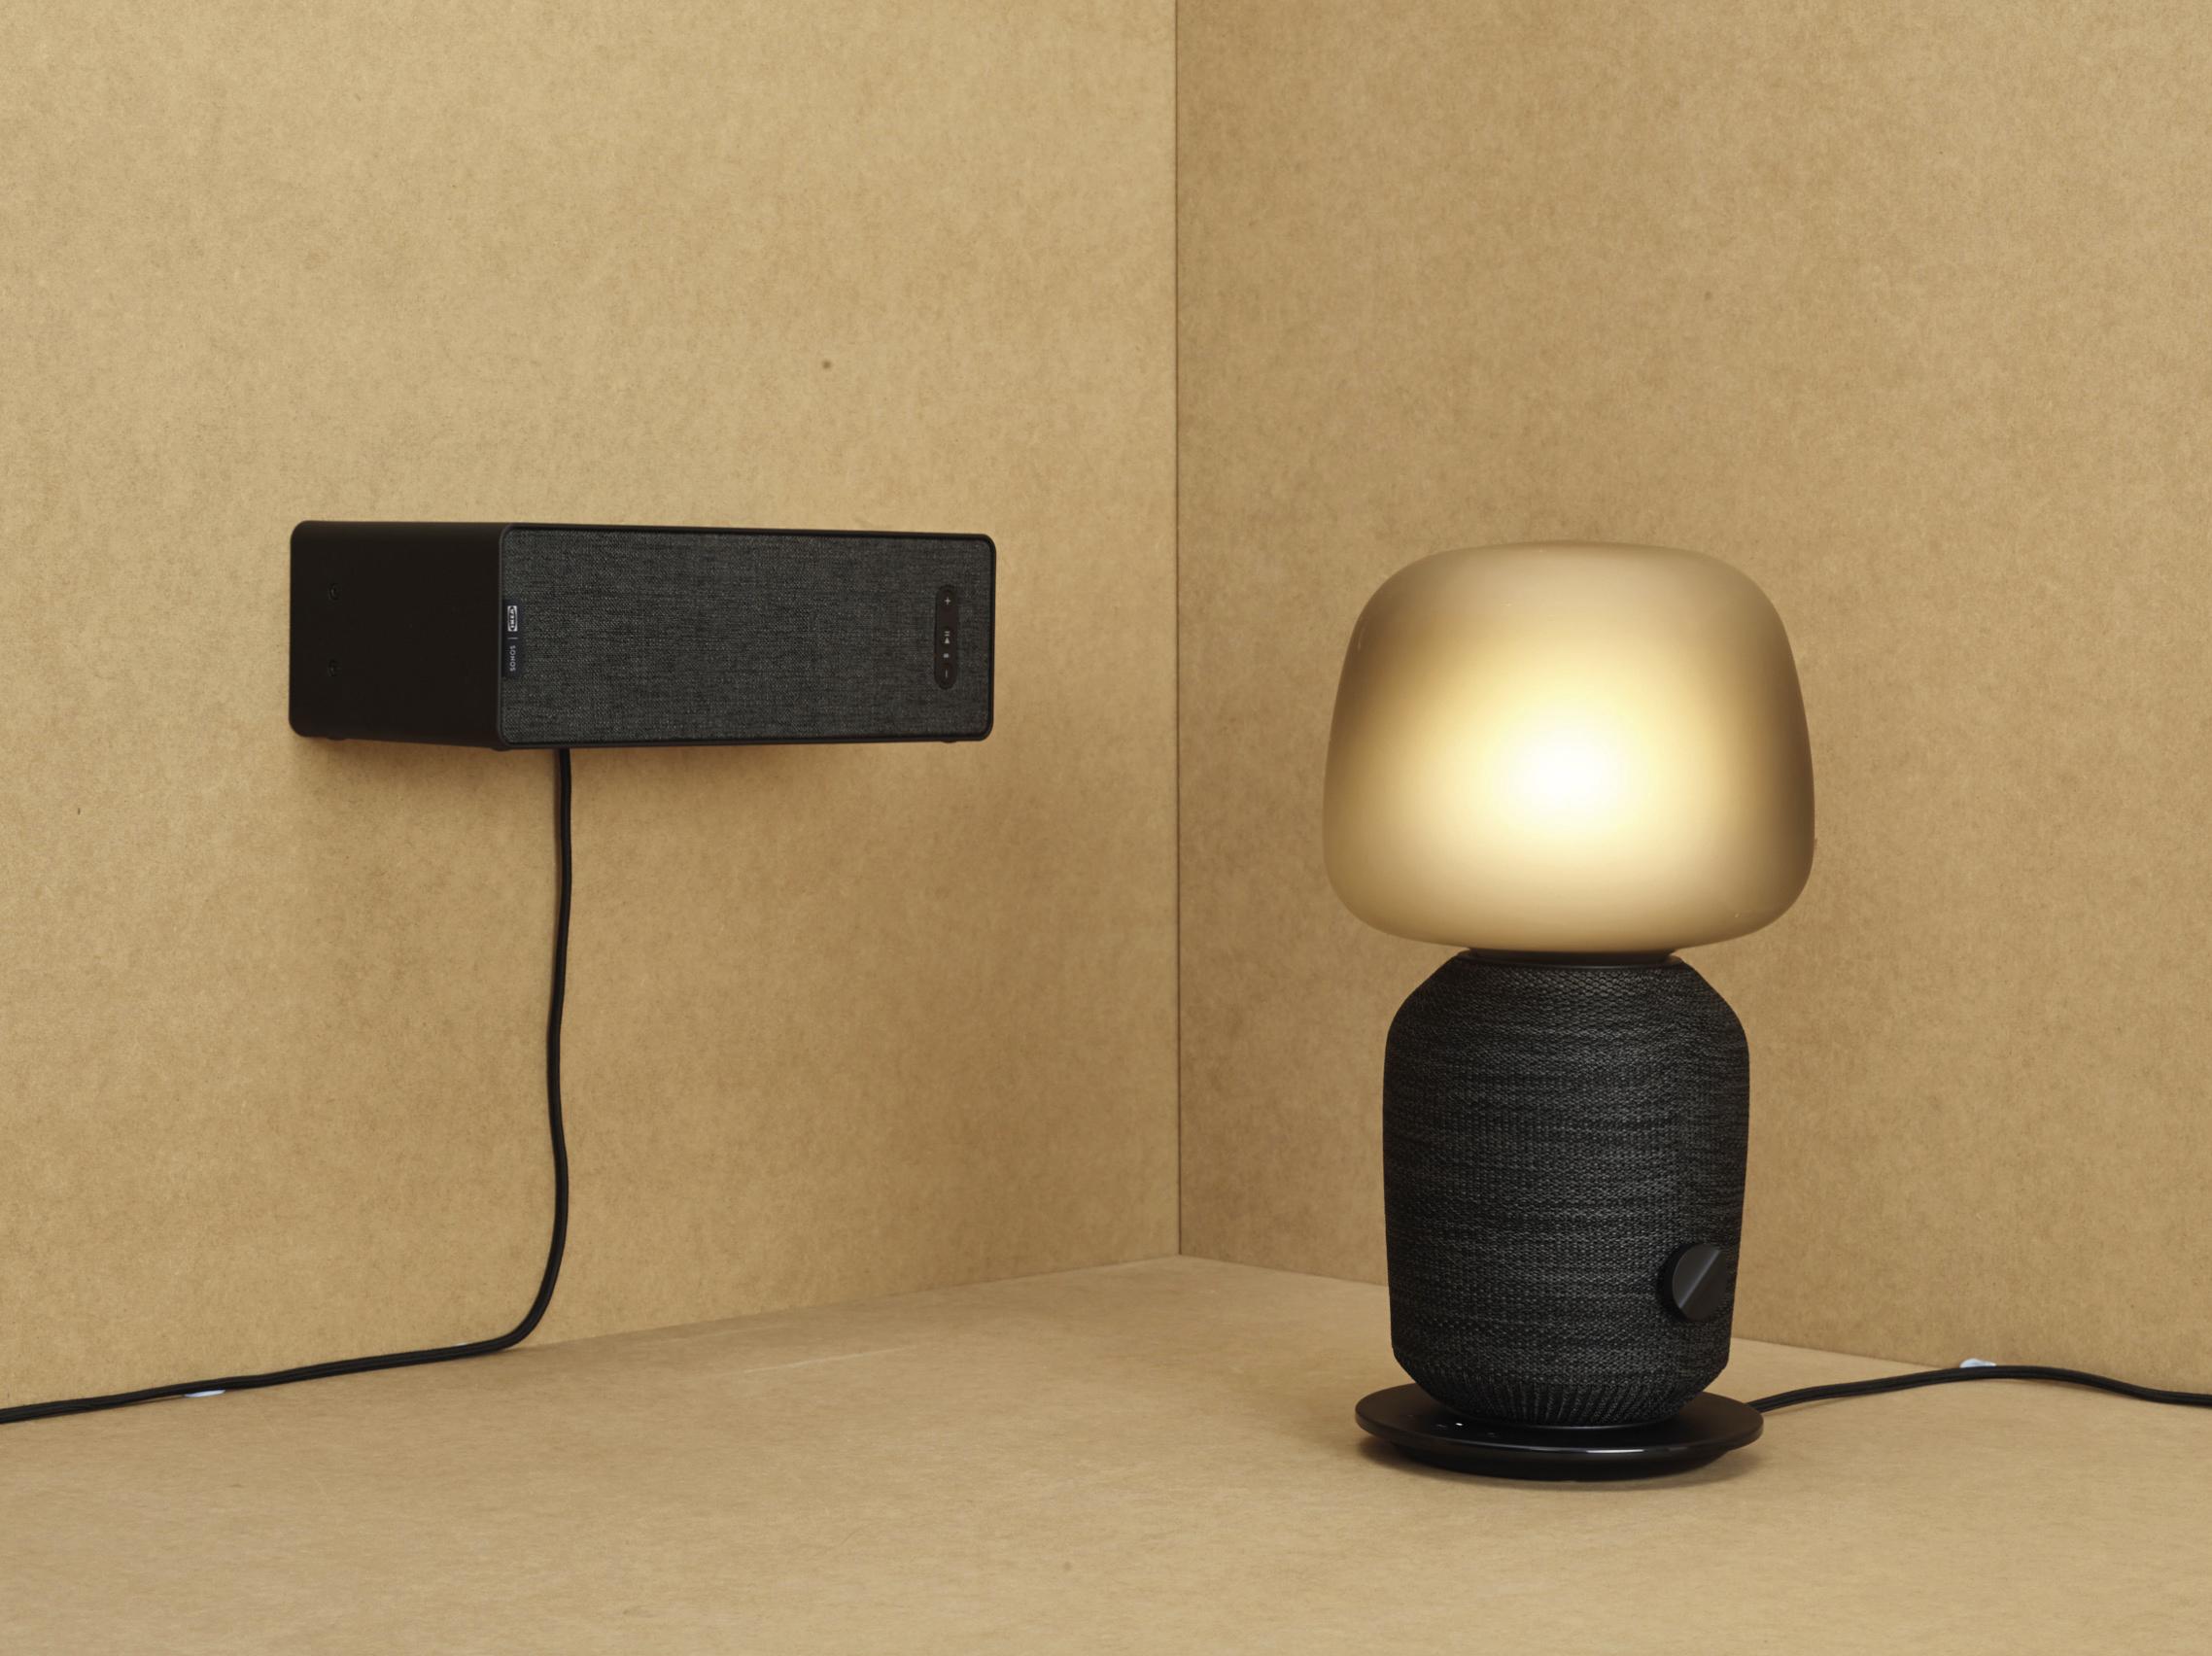 Ikea Lampe Hangend لم يسبق له مثيل الصور Tier3 Xyz